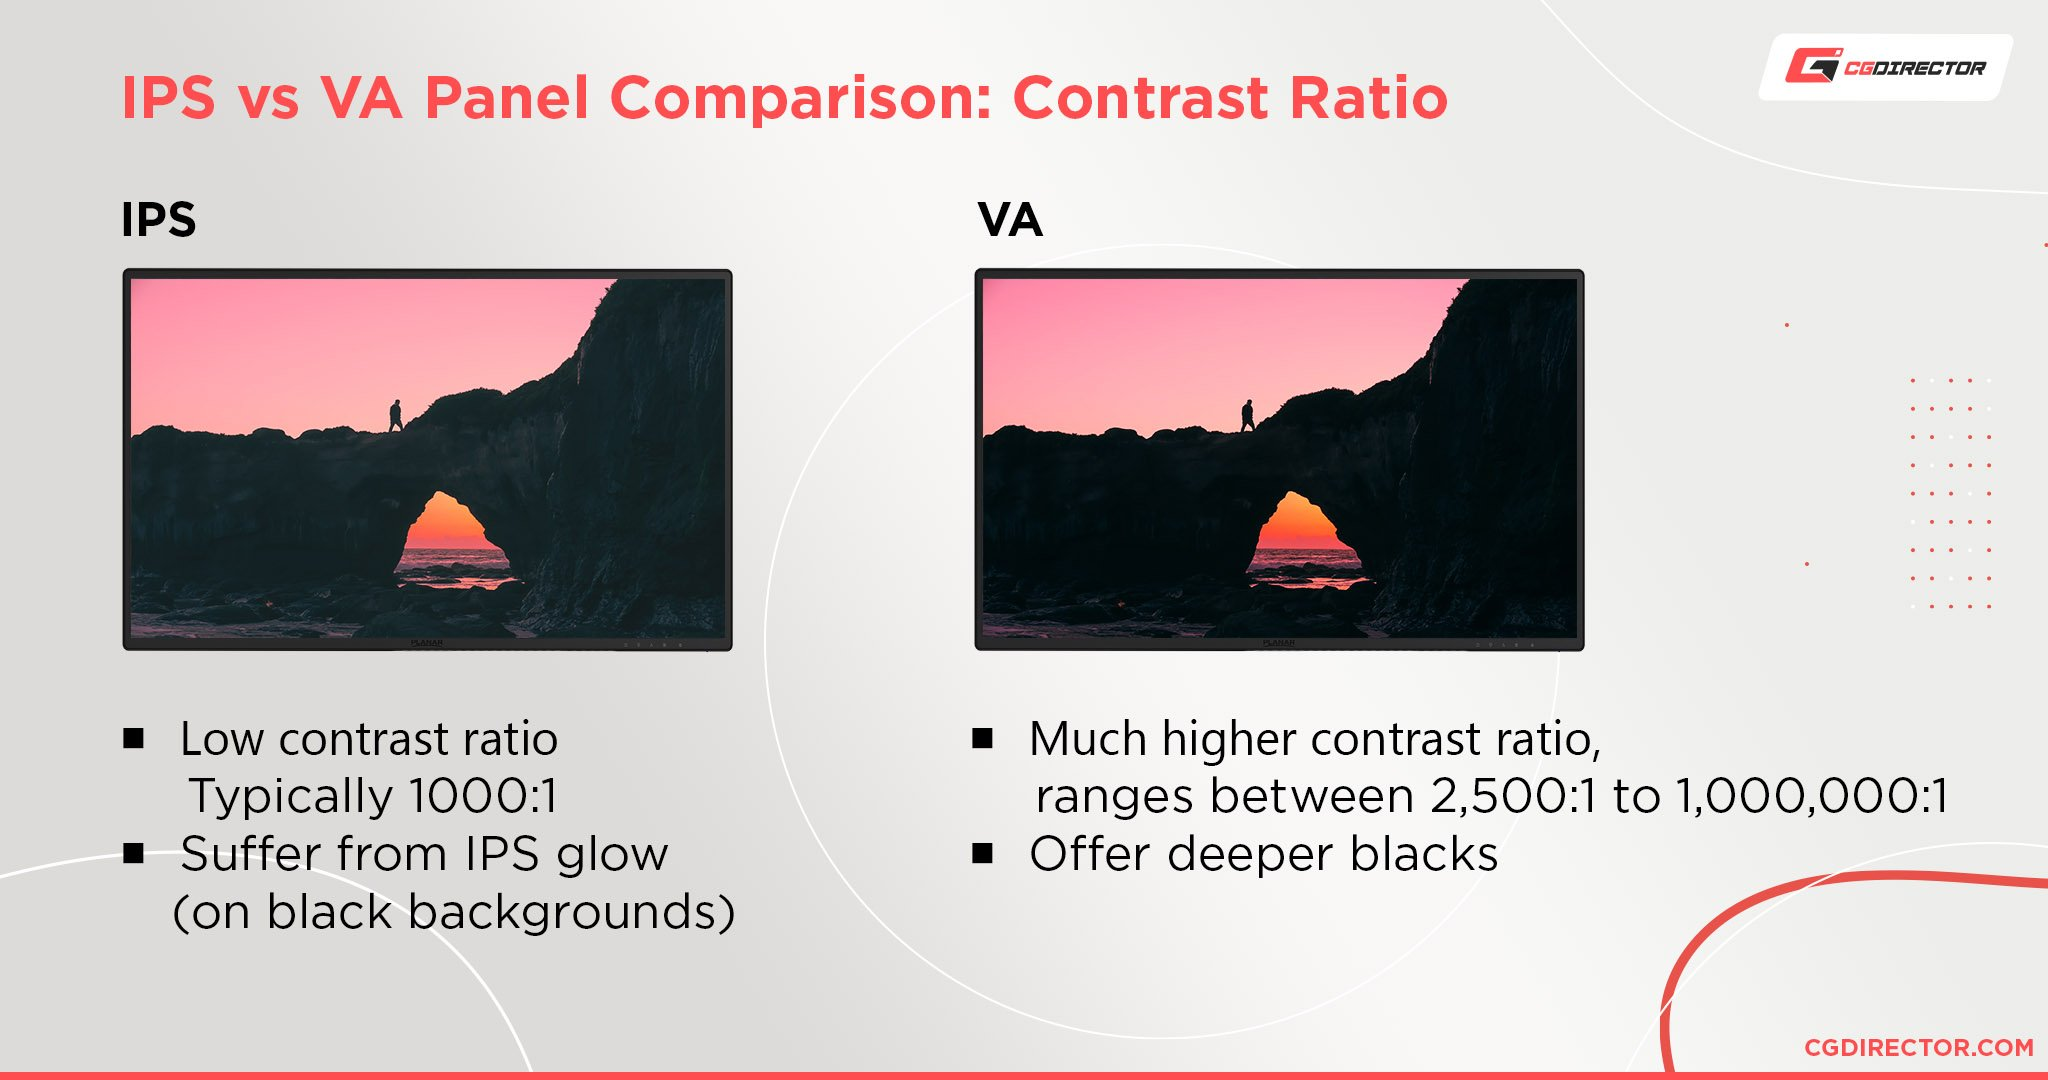 IPS vs VA Panel Comparison Contrast Ratio